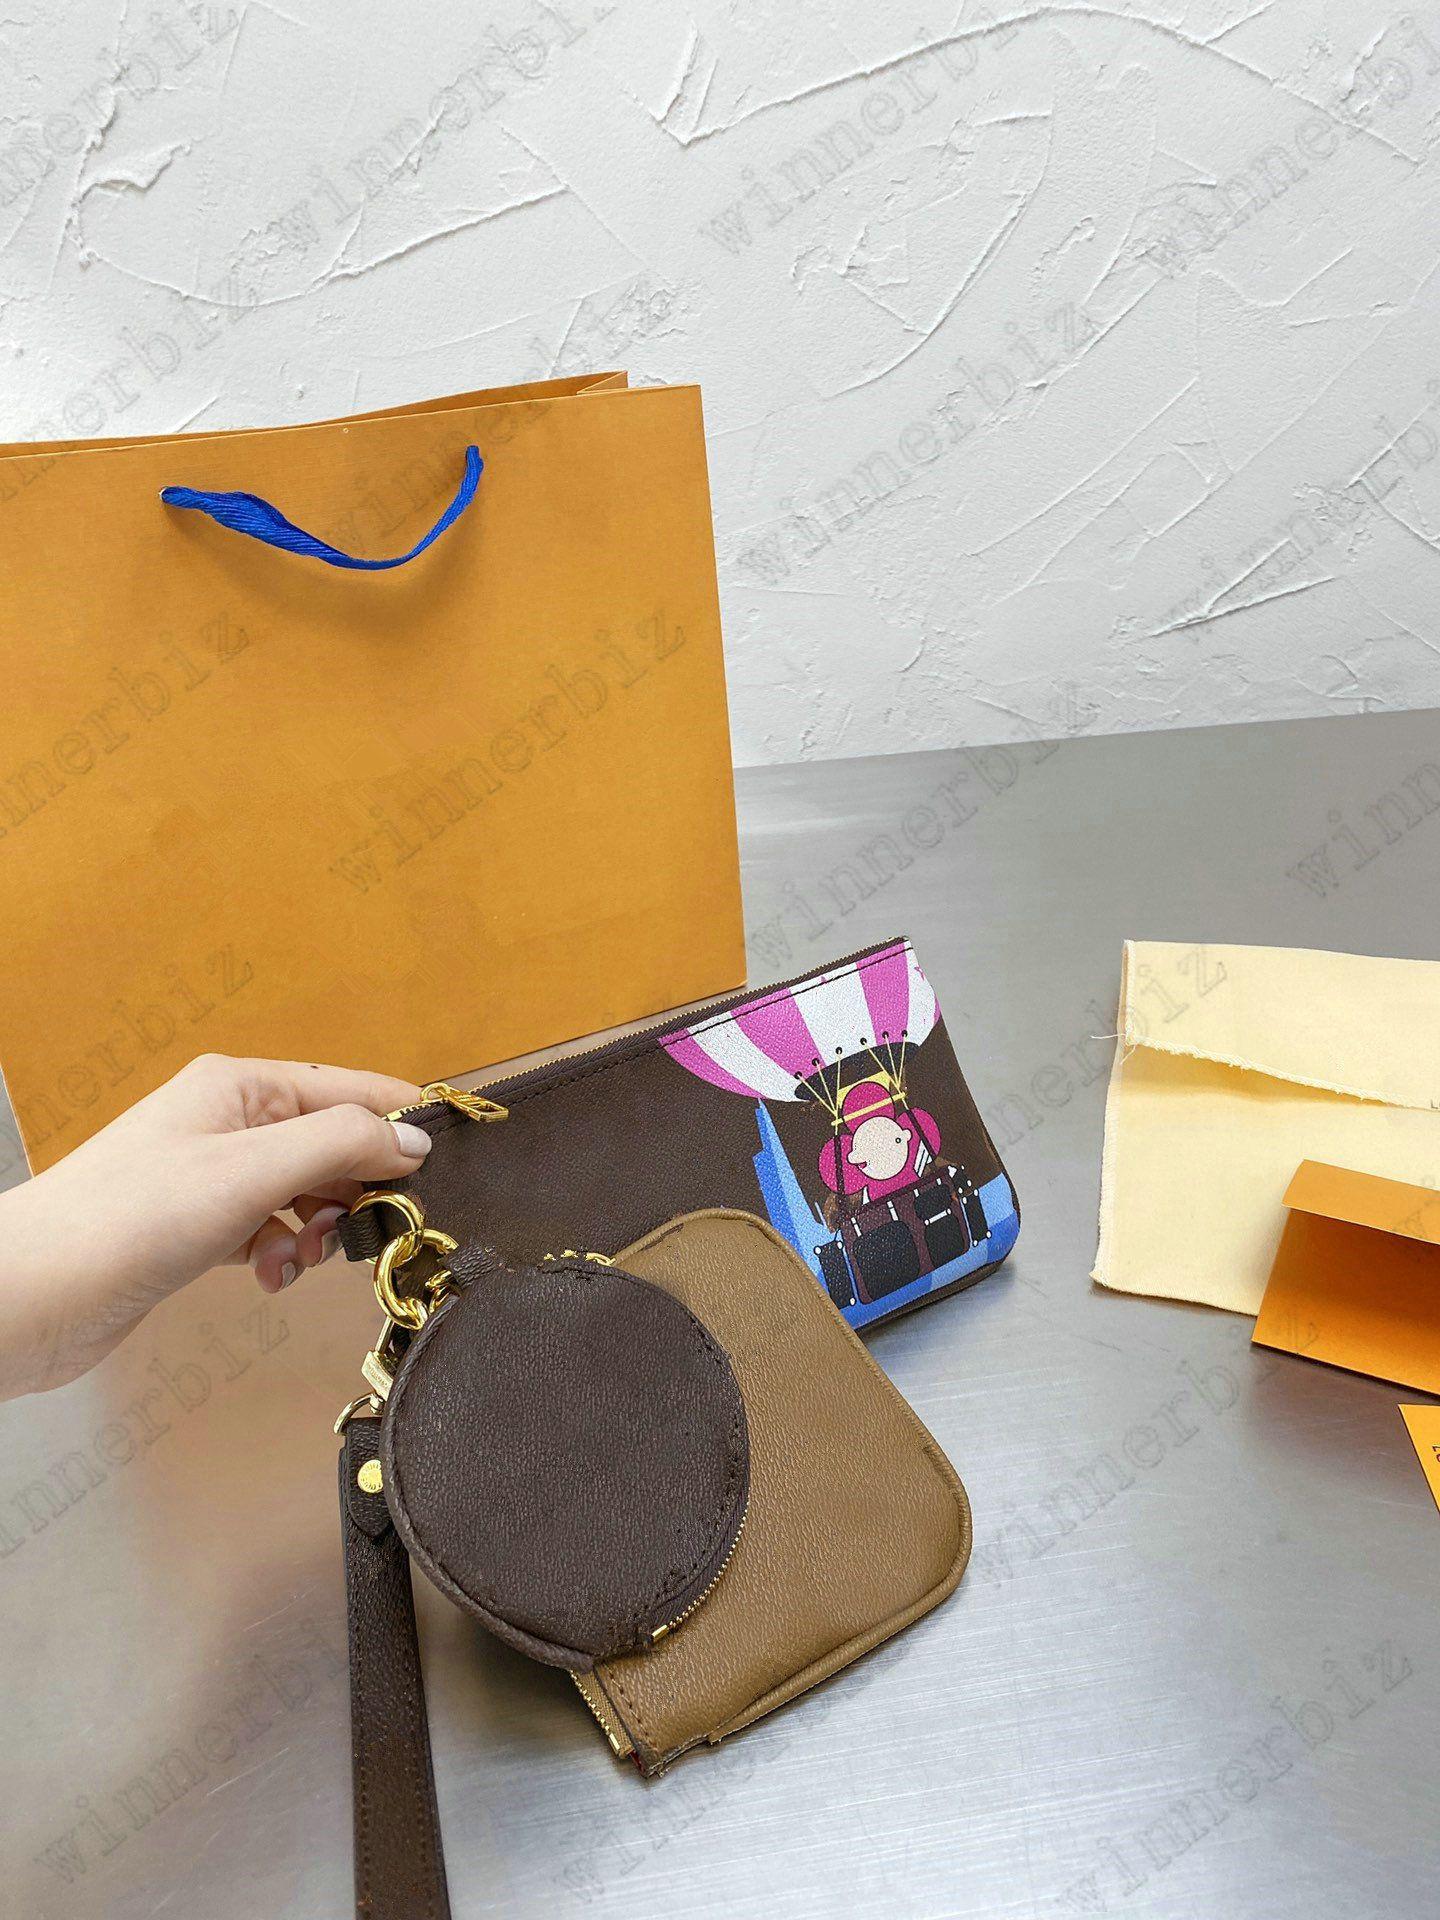 BAG BAG TRIO 3 PEZZI M80407 2021 By The Polies Iconic Leather Designer Small Handbag Designer Luxurys Womens Handle Key Bags Summer 3pcs Portafoglio portamonete